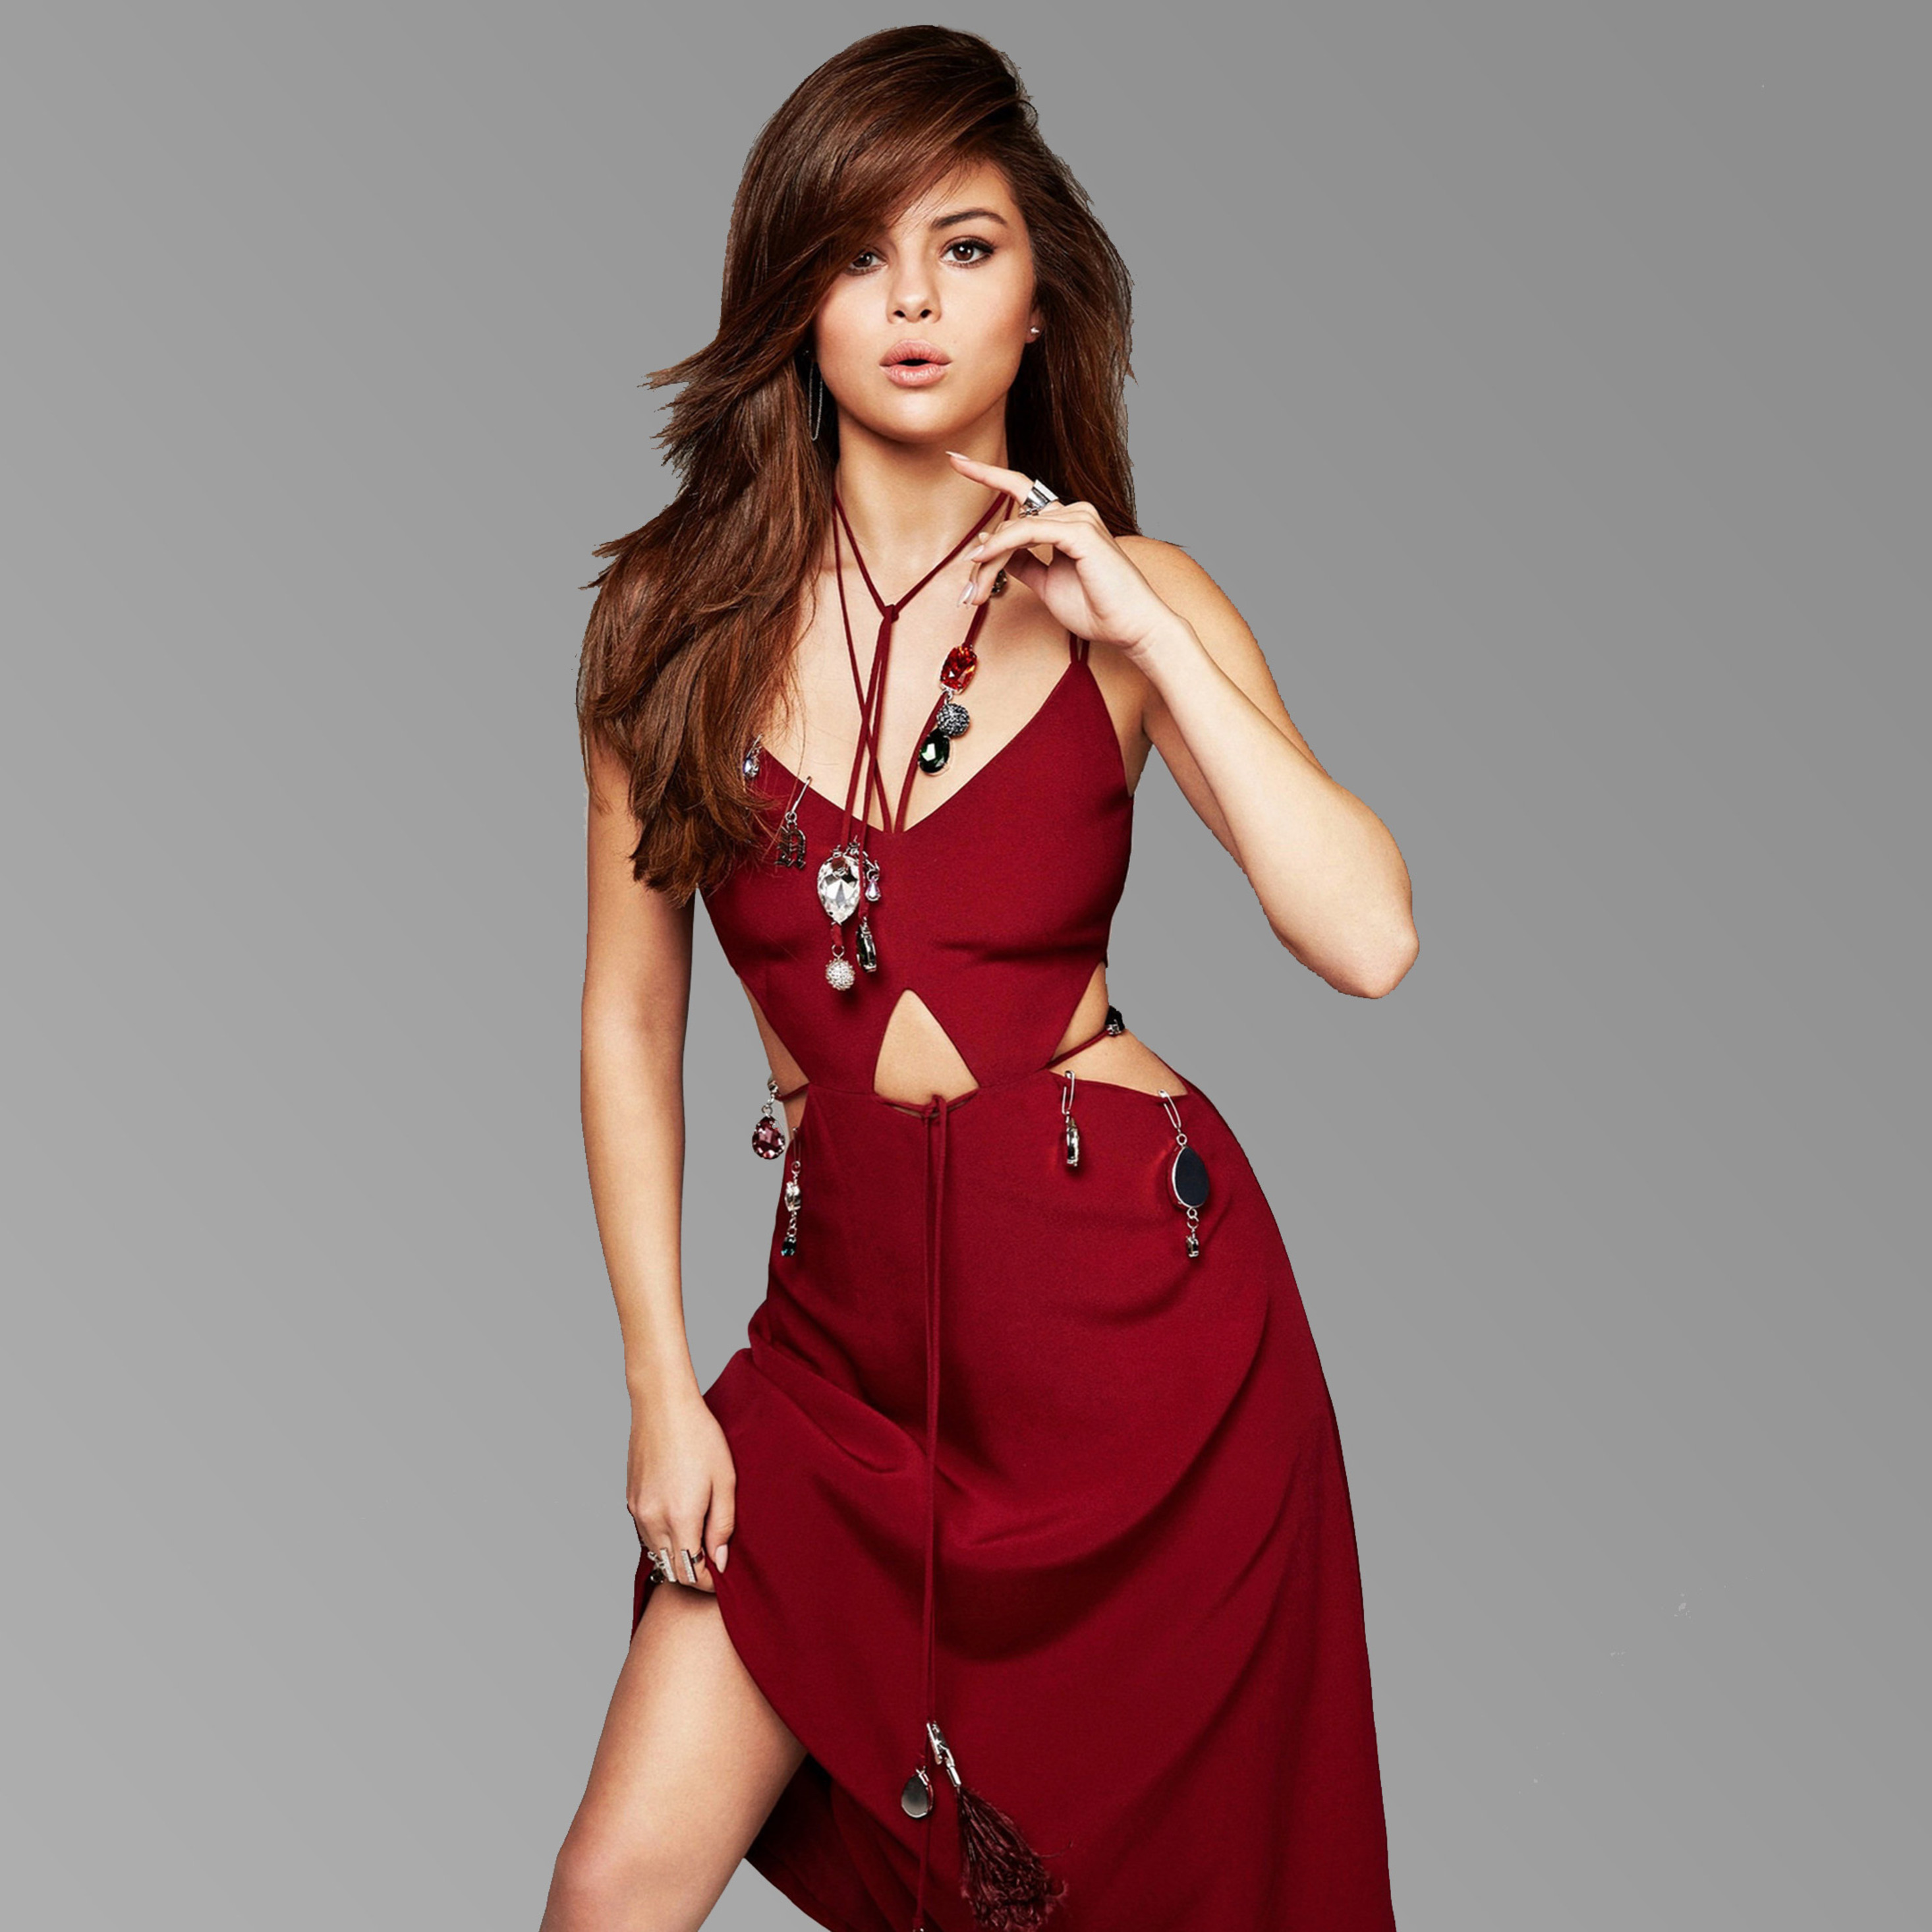 Selena gomez36 nudes (42 photos), Ass Celebrity picture